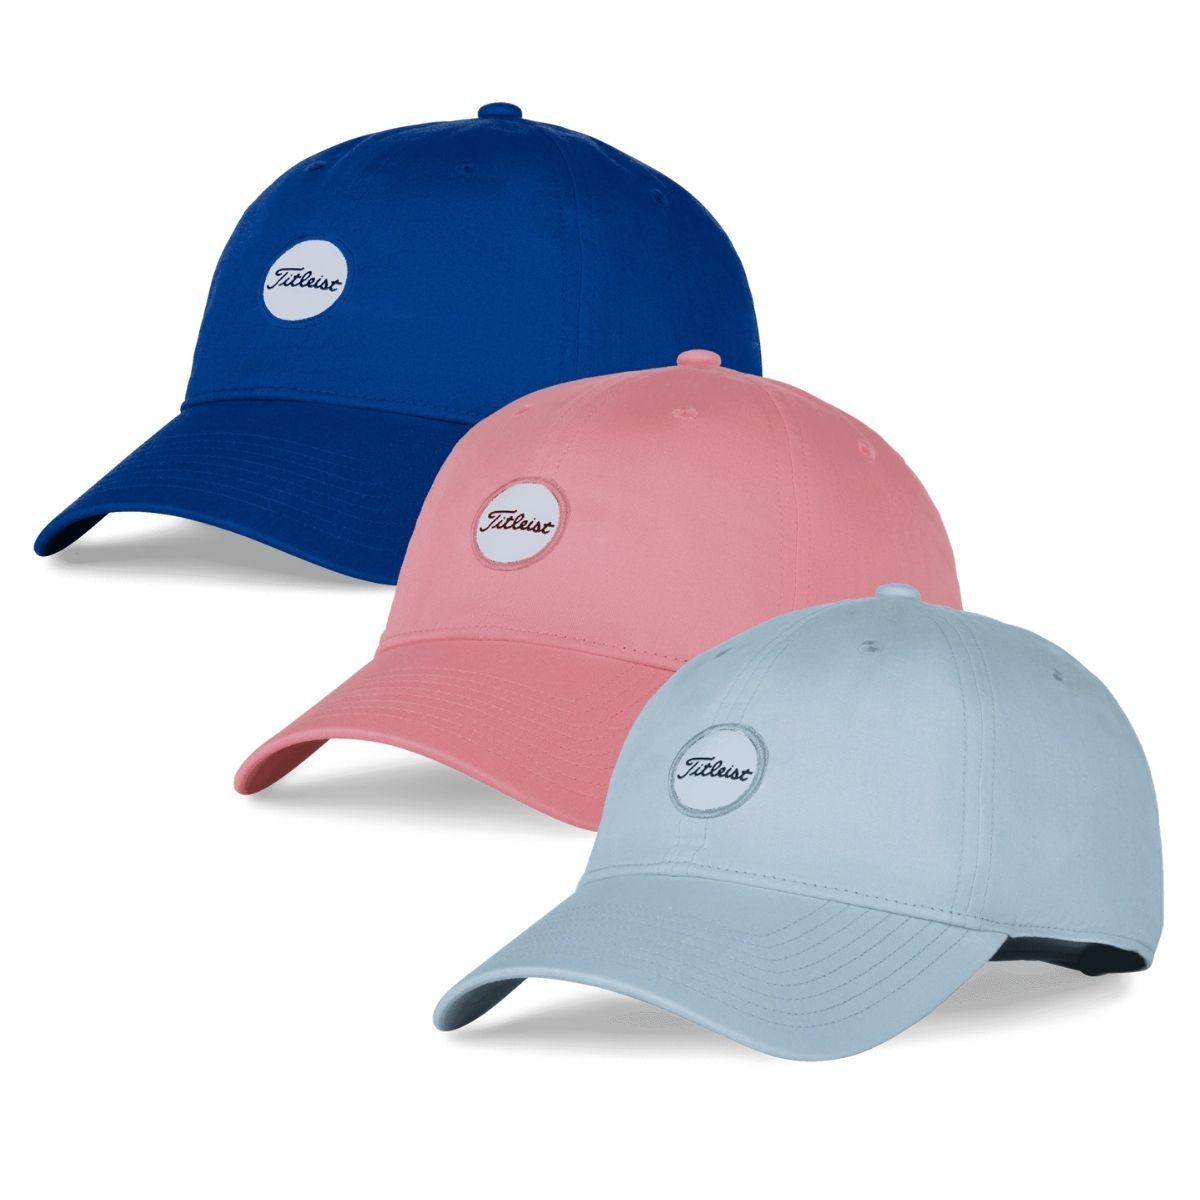 Titleist 2021 Men's Montauk Lightweight Hat